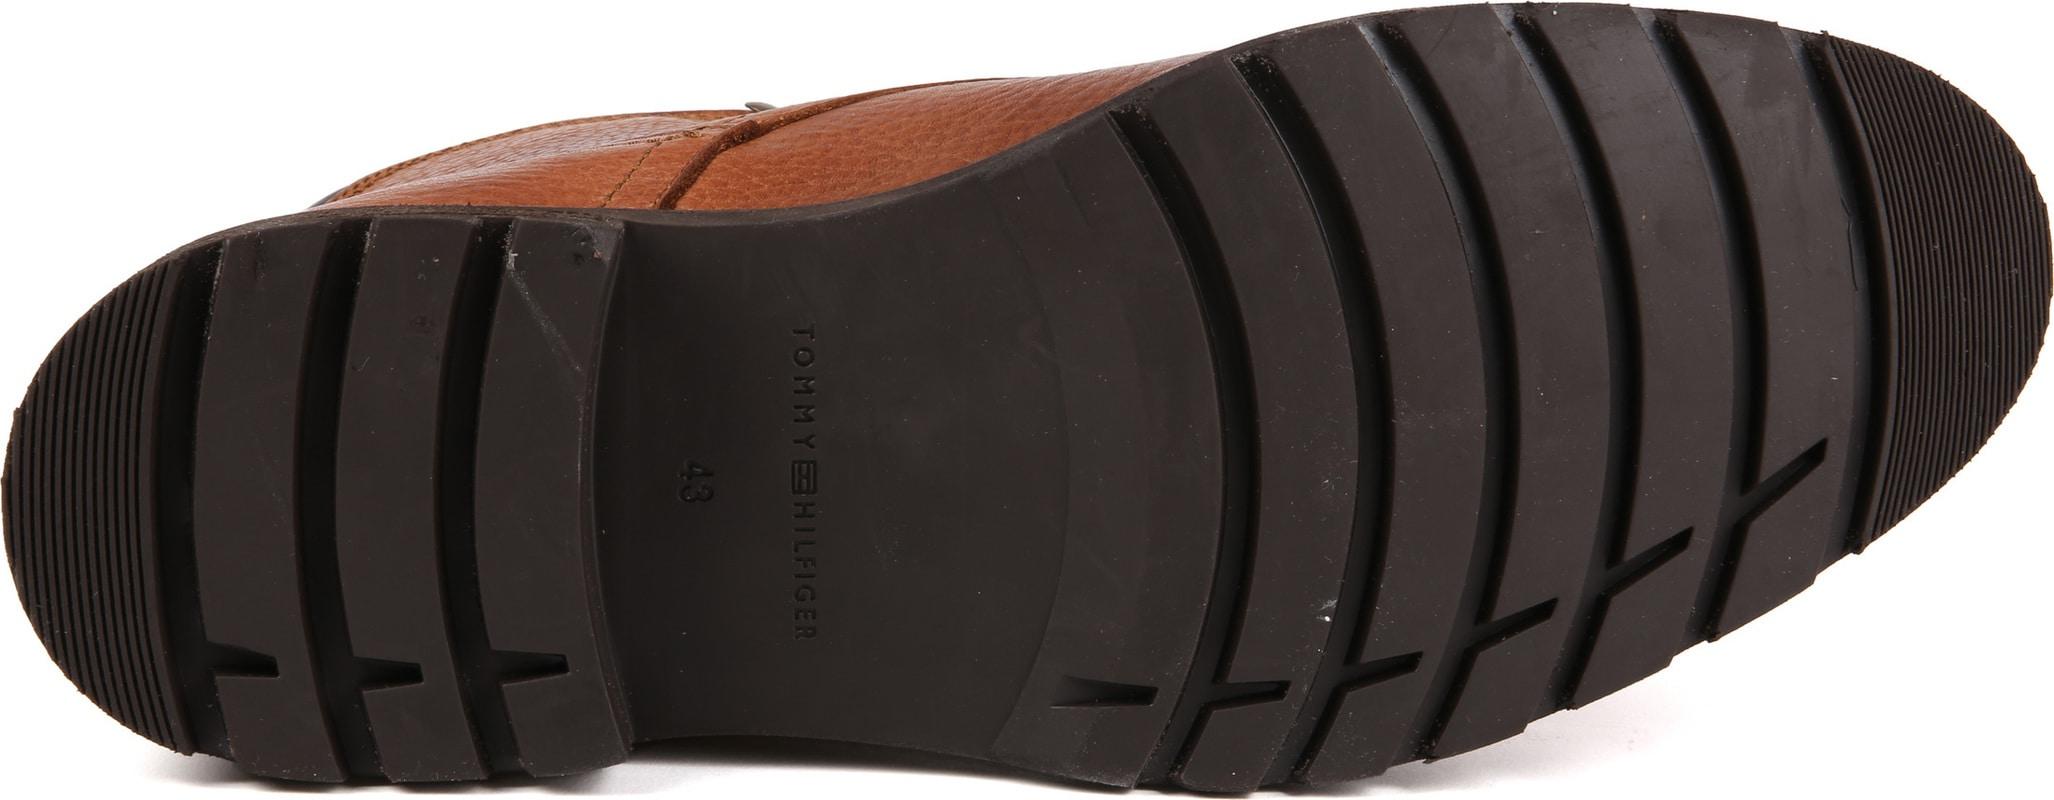 Tommy Hilfiger Boots Cognac photo 3